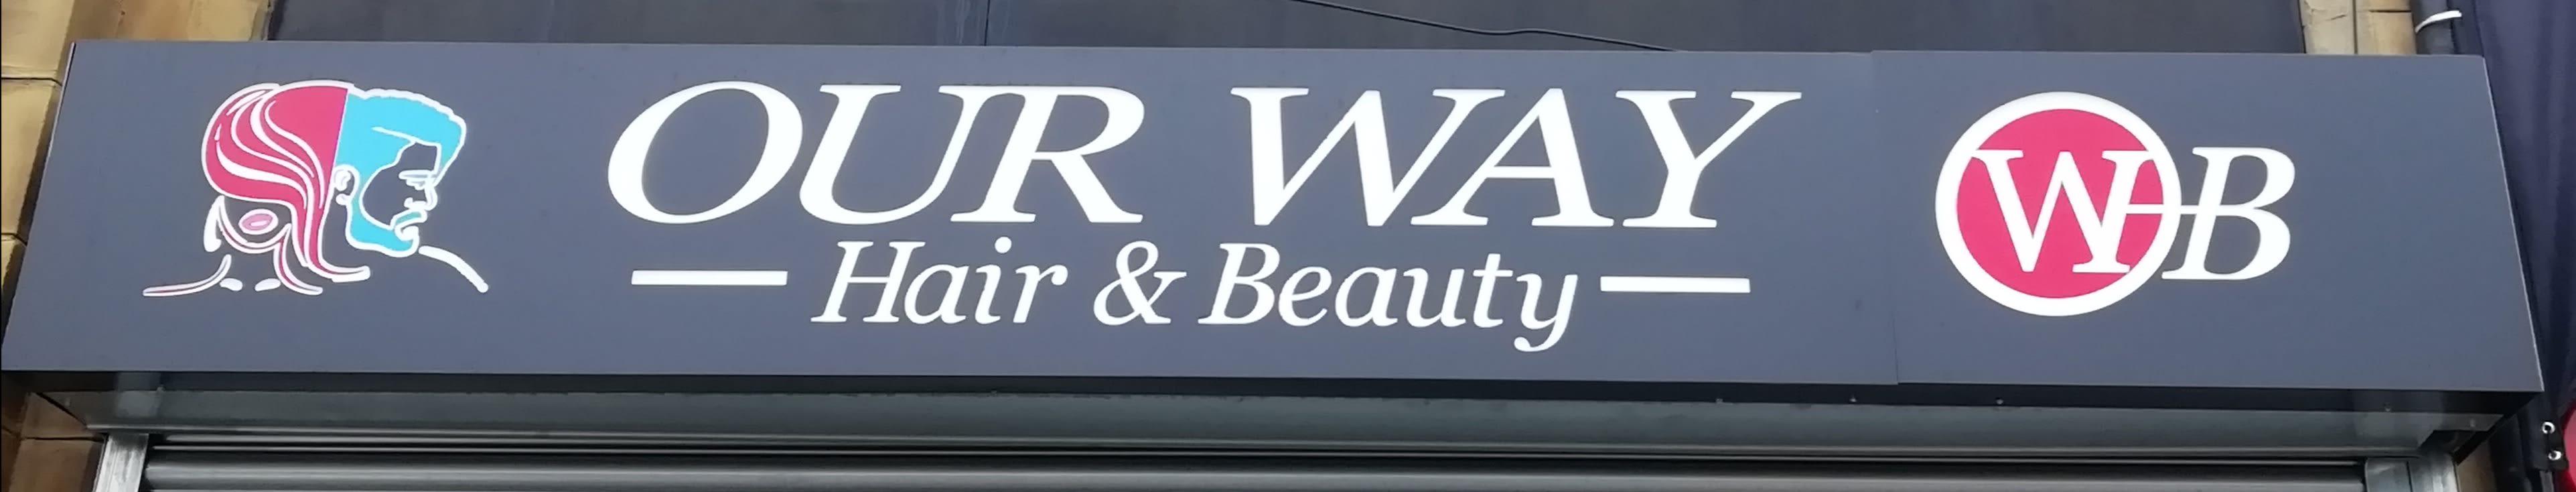 Our Way Hair & Beauty Ltd